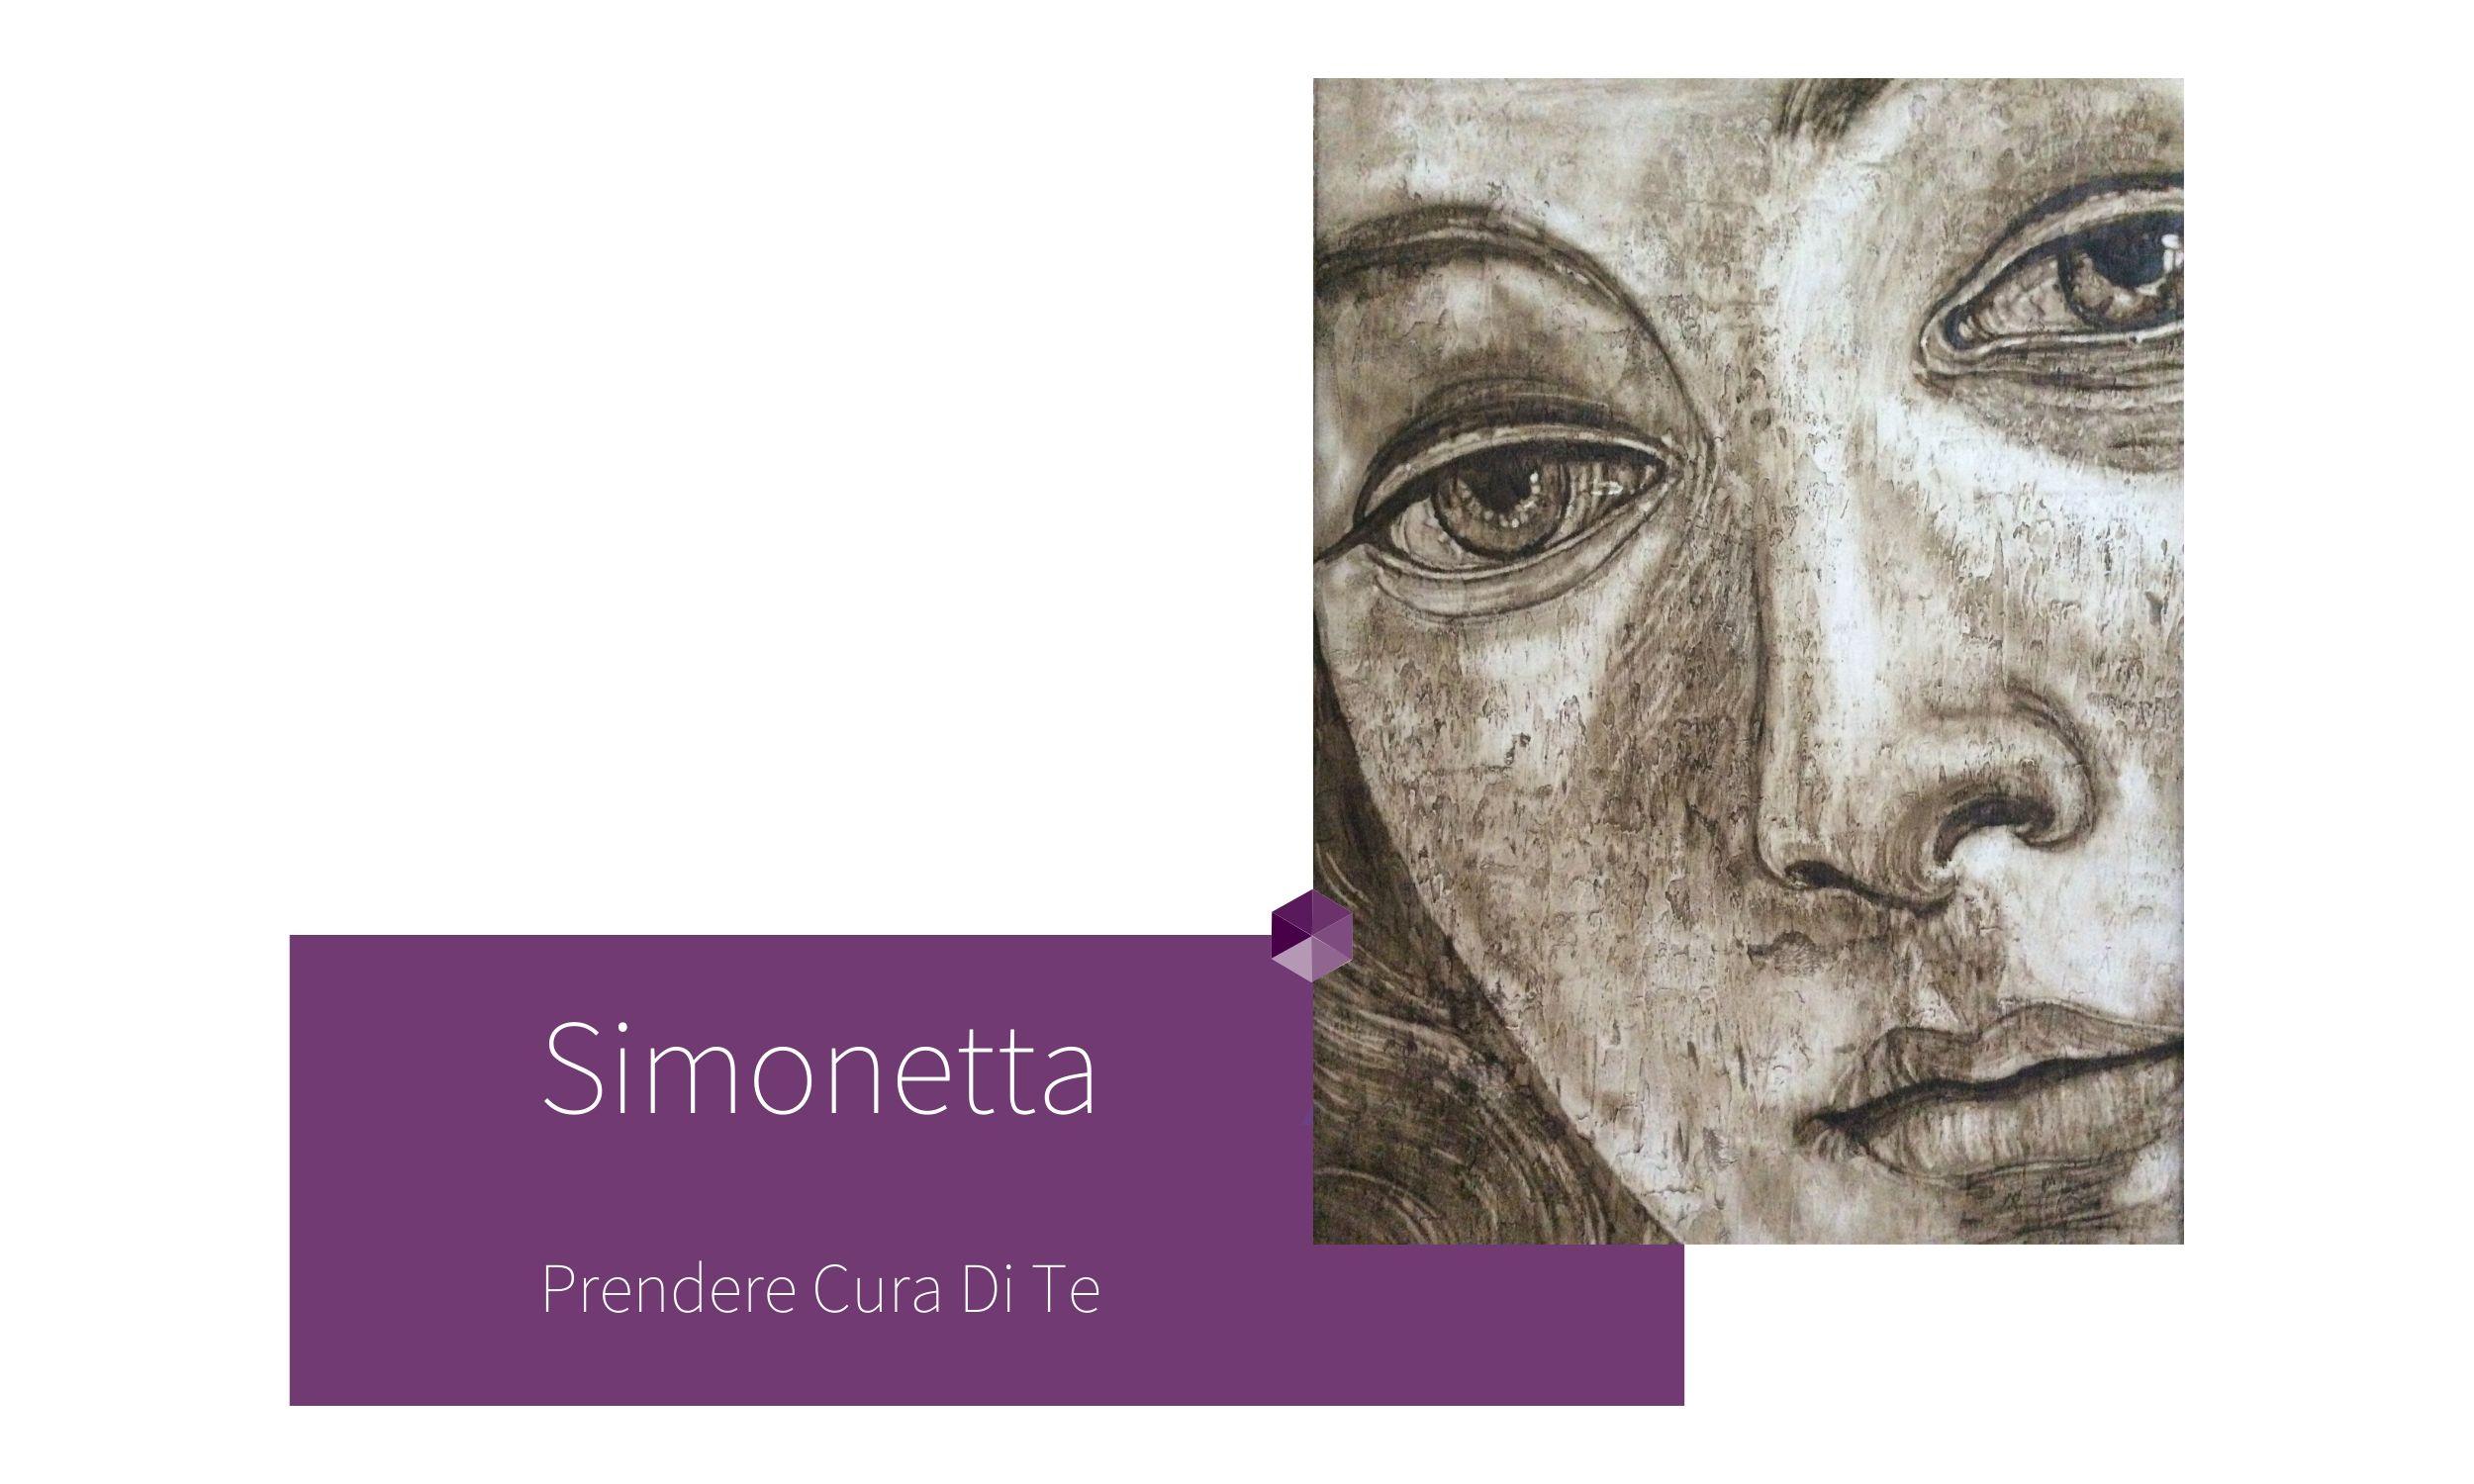 SIMONETTA CATTANEO | por C.J.Ruiz Colección Flor de Ziur | PRENDERE CURA DI TE